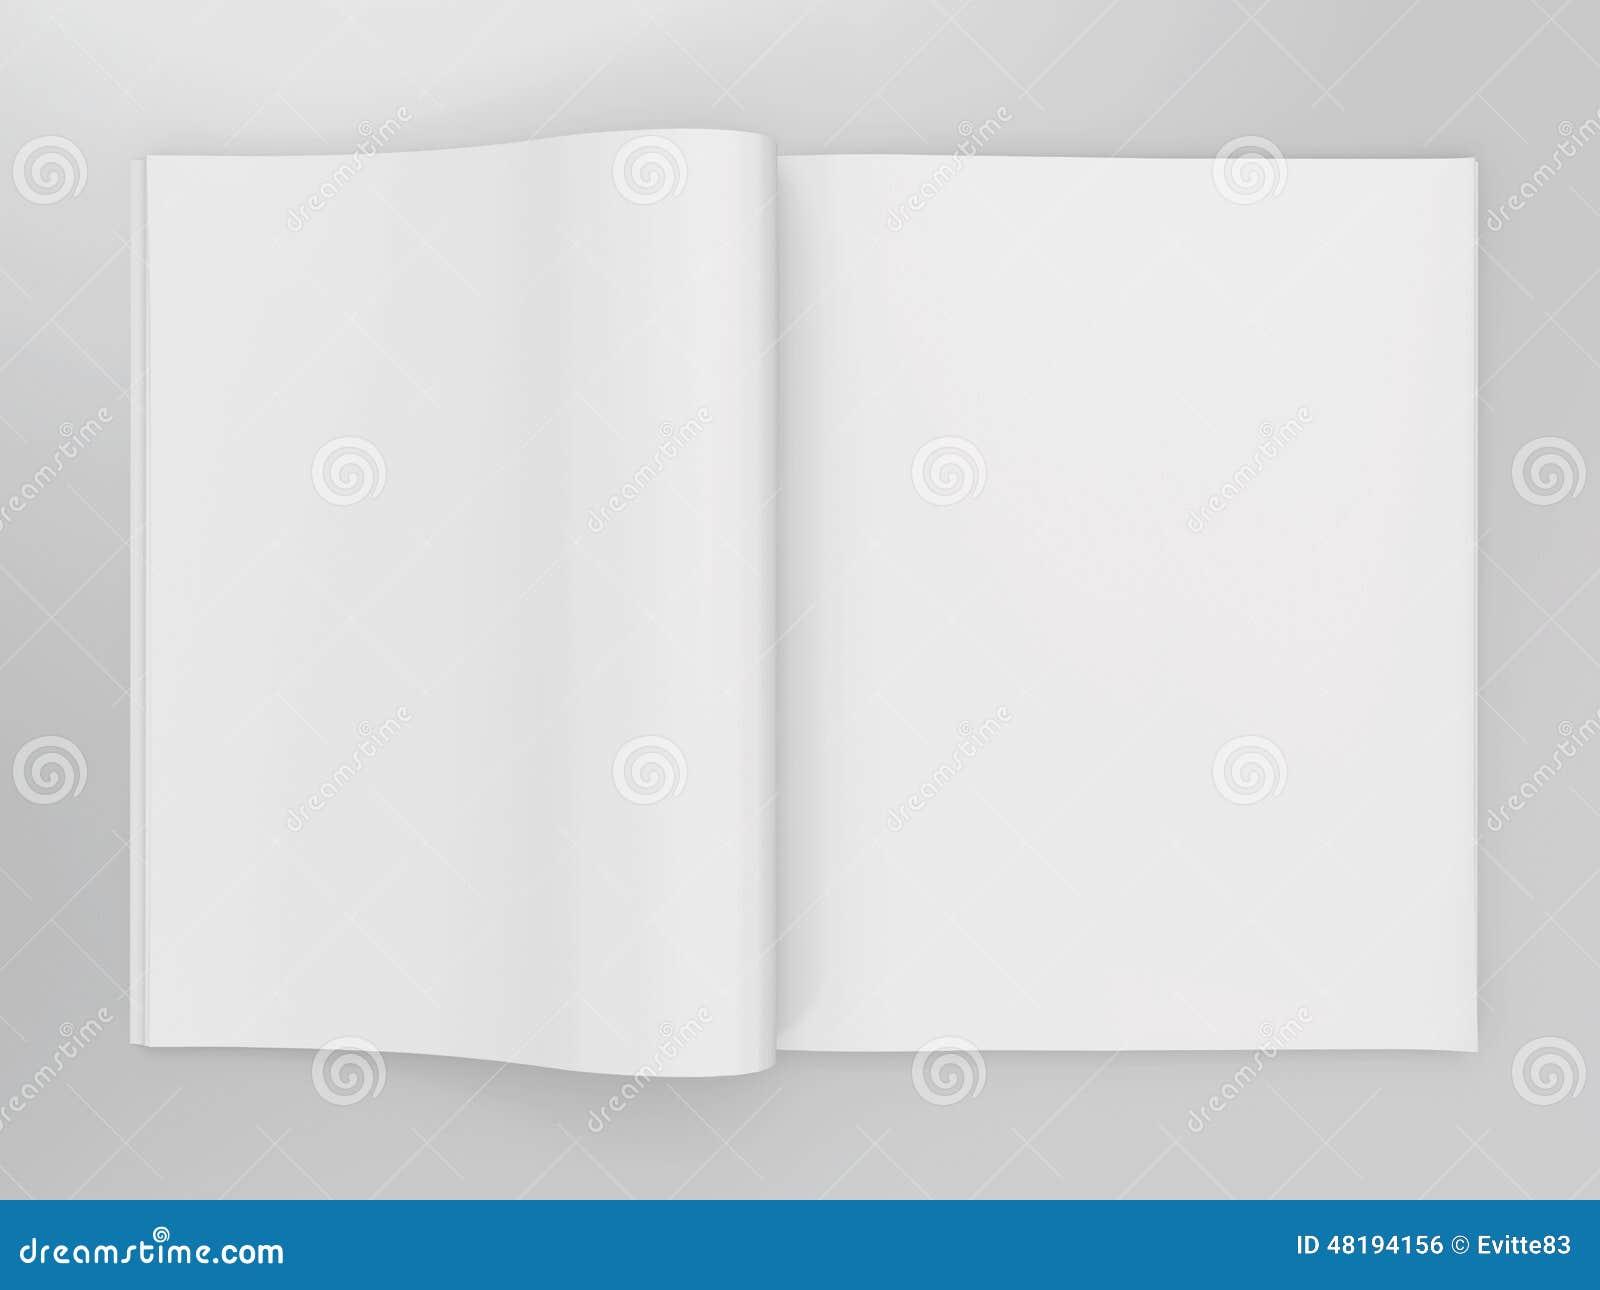 Booklet Mockup Template